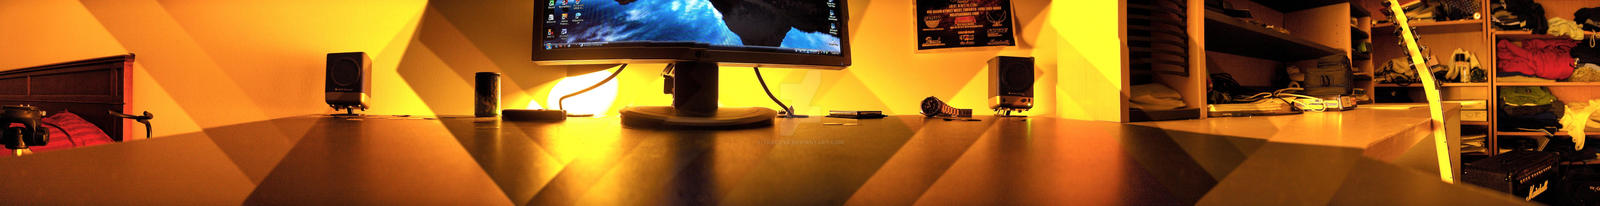 270 Degree - Desktop by Traczyk